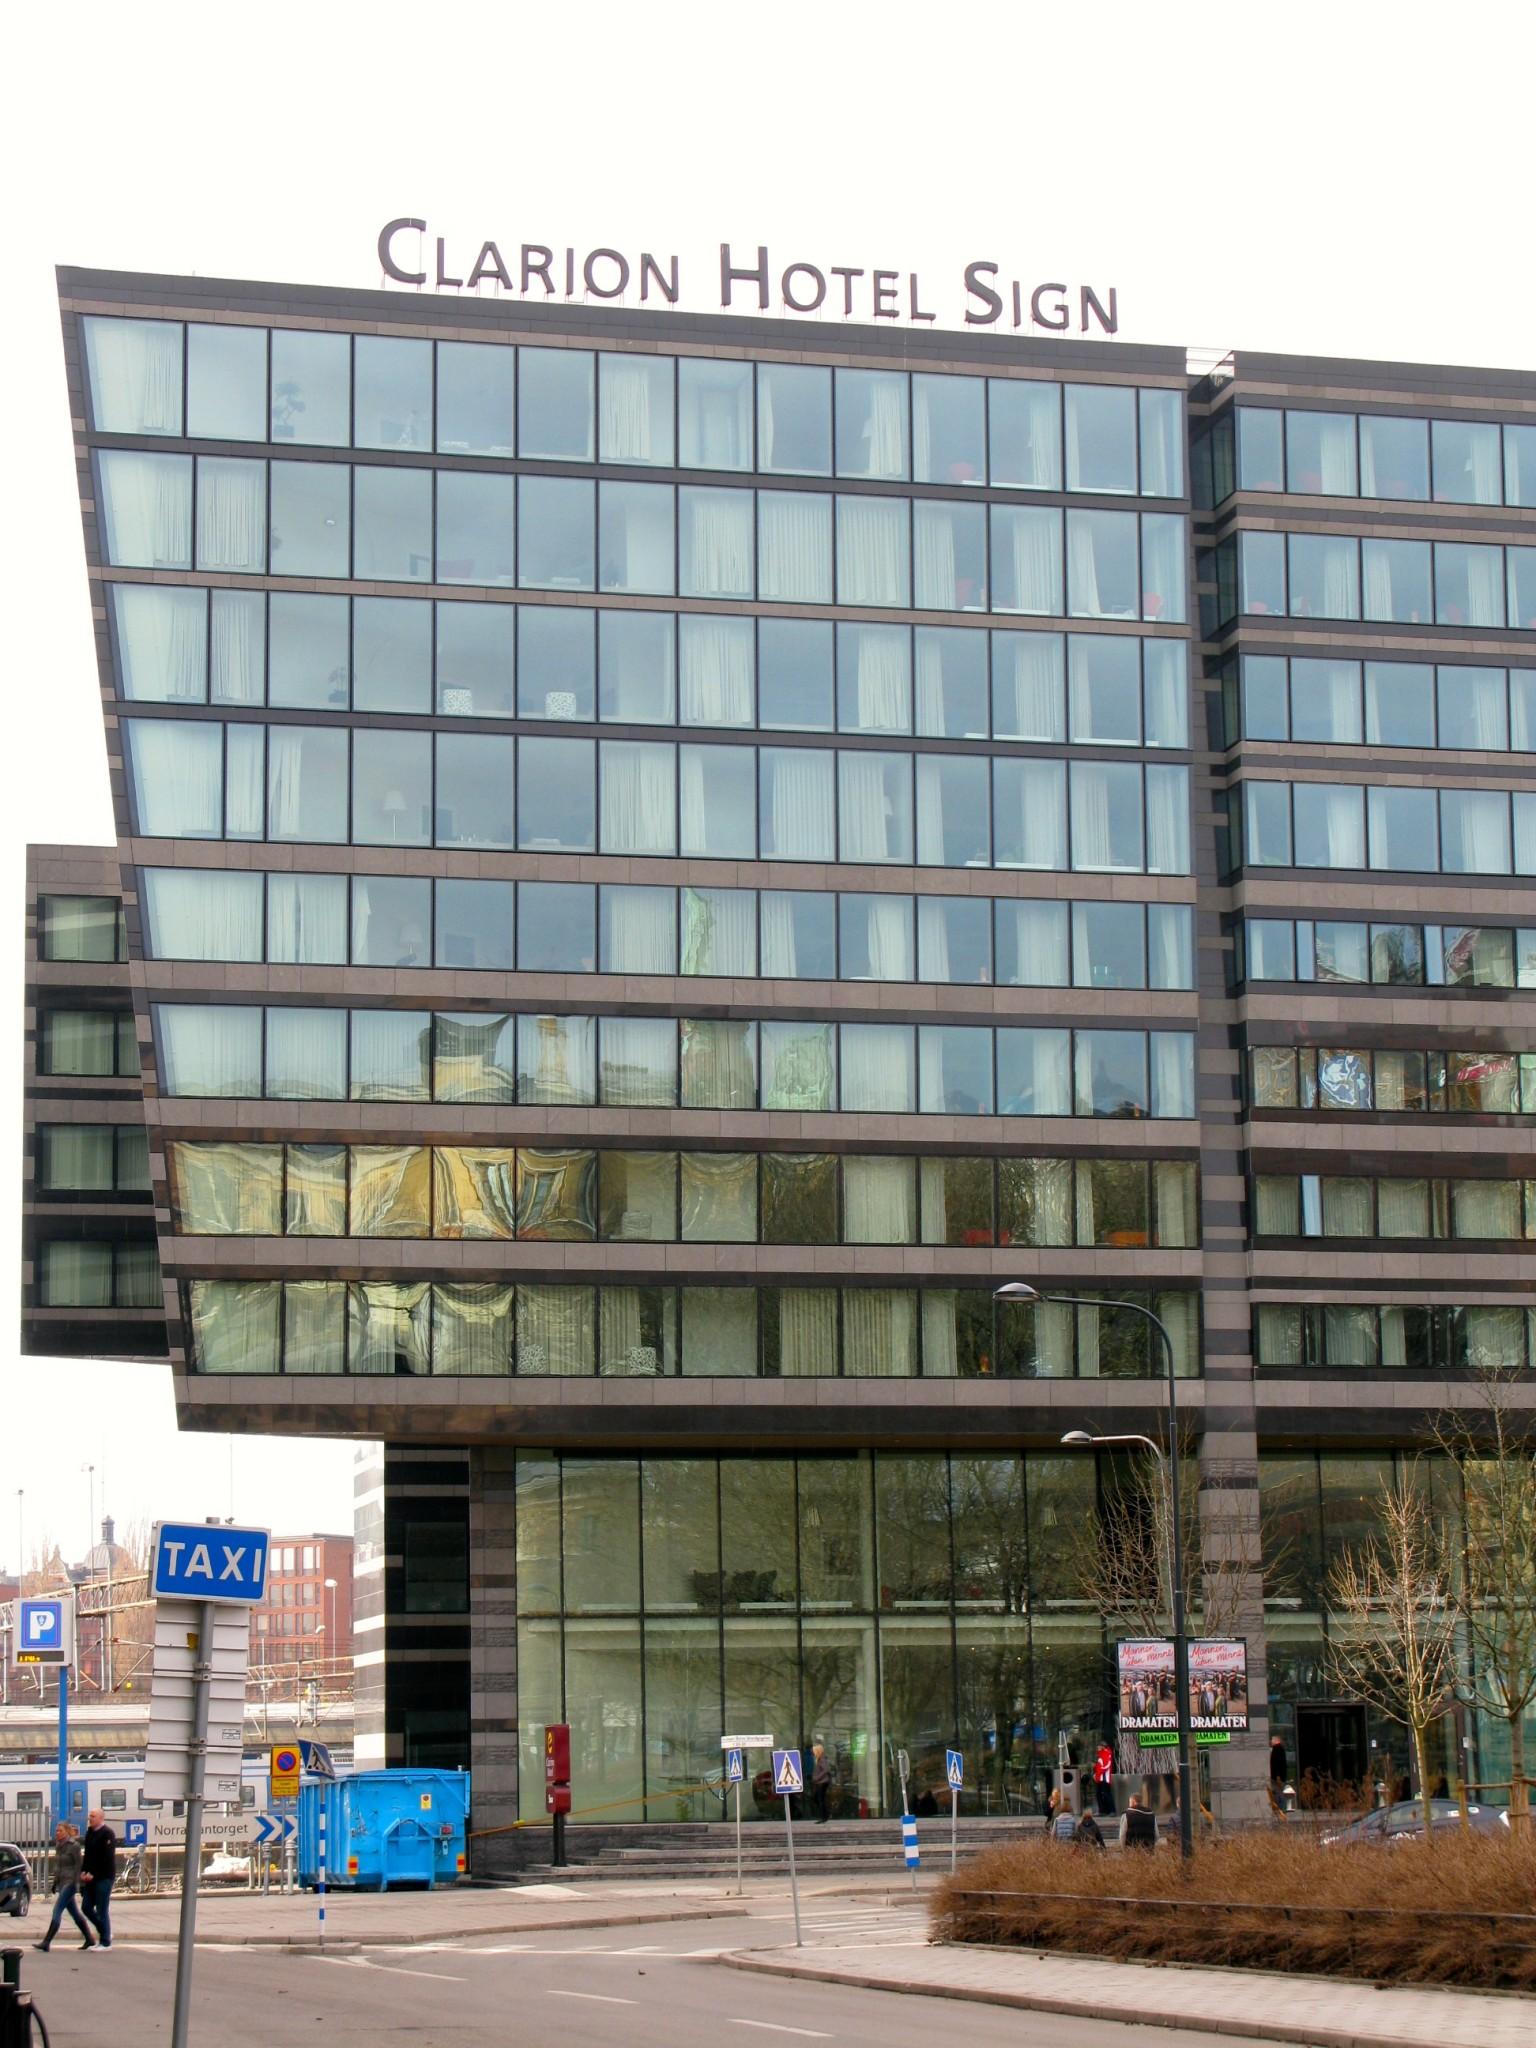 Clarion Hotel Sign Tukholma